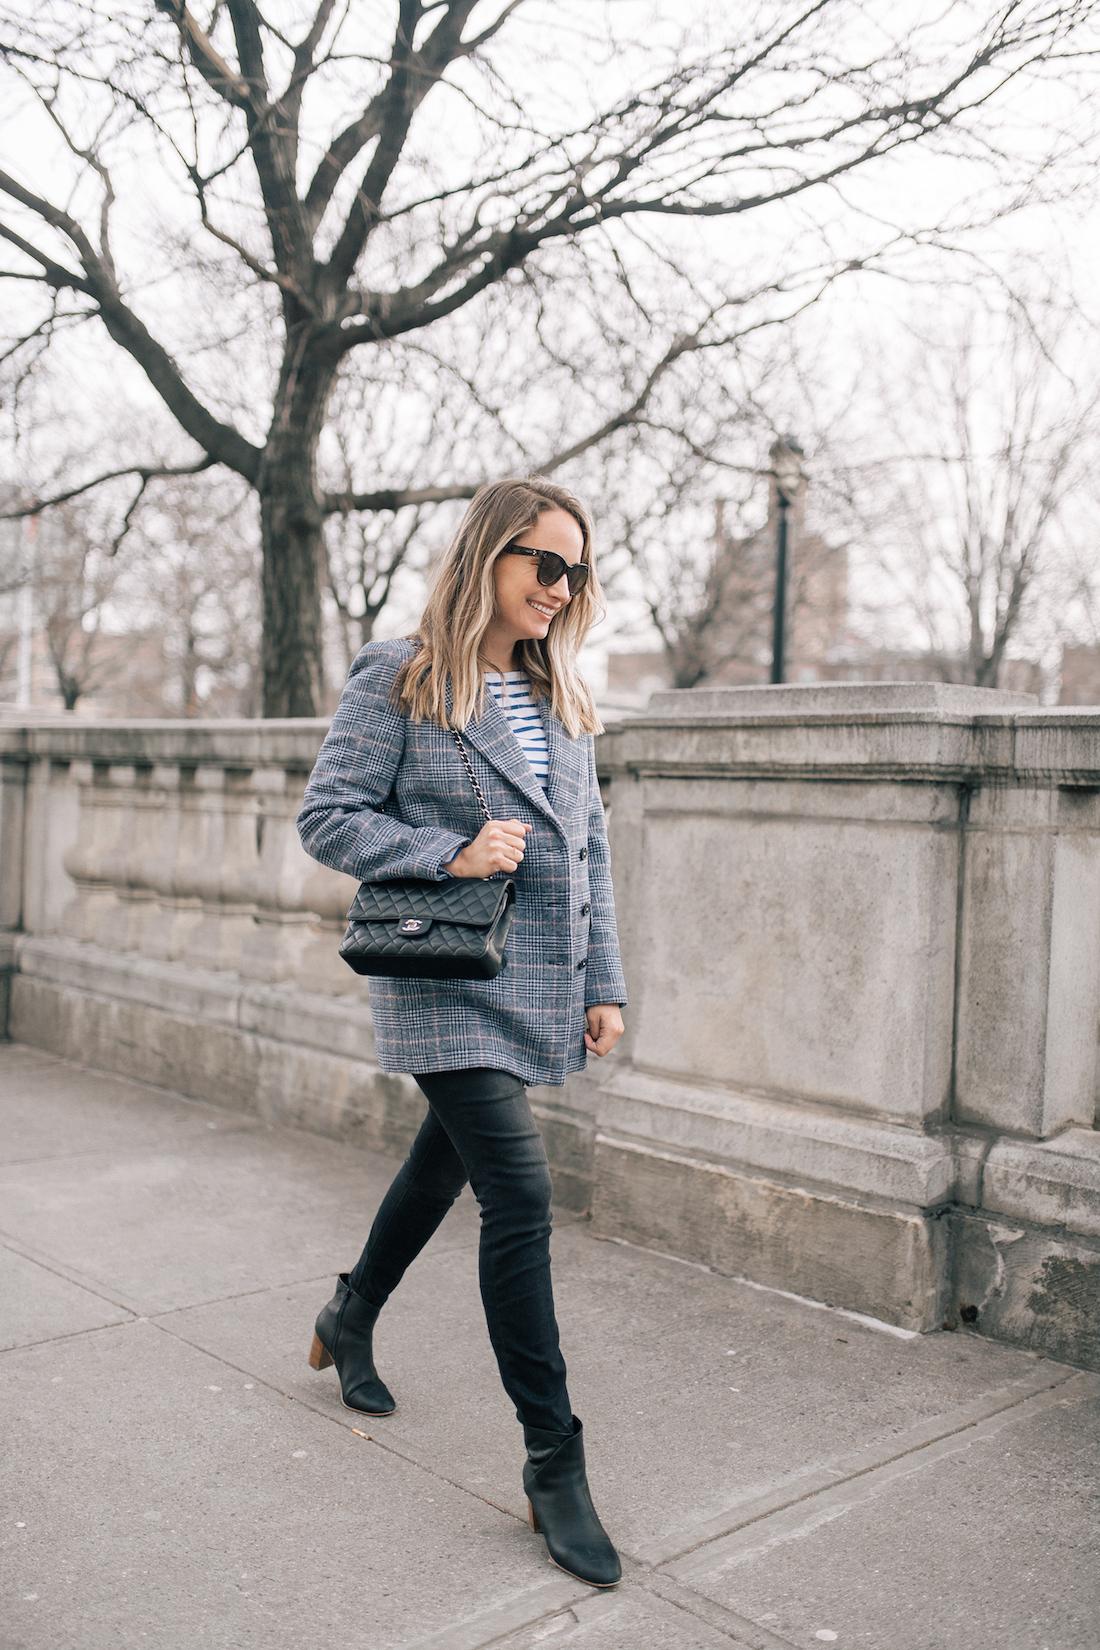 "GRACE ATWOOD OUTFIT DETAILS: La Vie Rebecca Taylor Coat // Saint James Tee // Paige Jeans // Gucci Belt // Soludos Boots // Polaroid Sunglasses // Lipstick: Charlotte Tilbury in ""Bitch Perfect"""